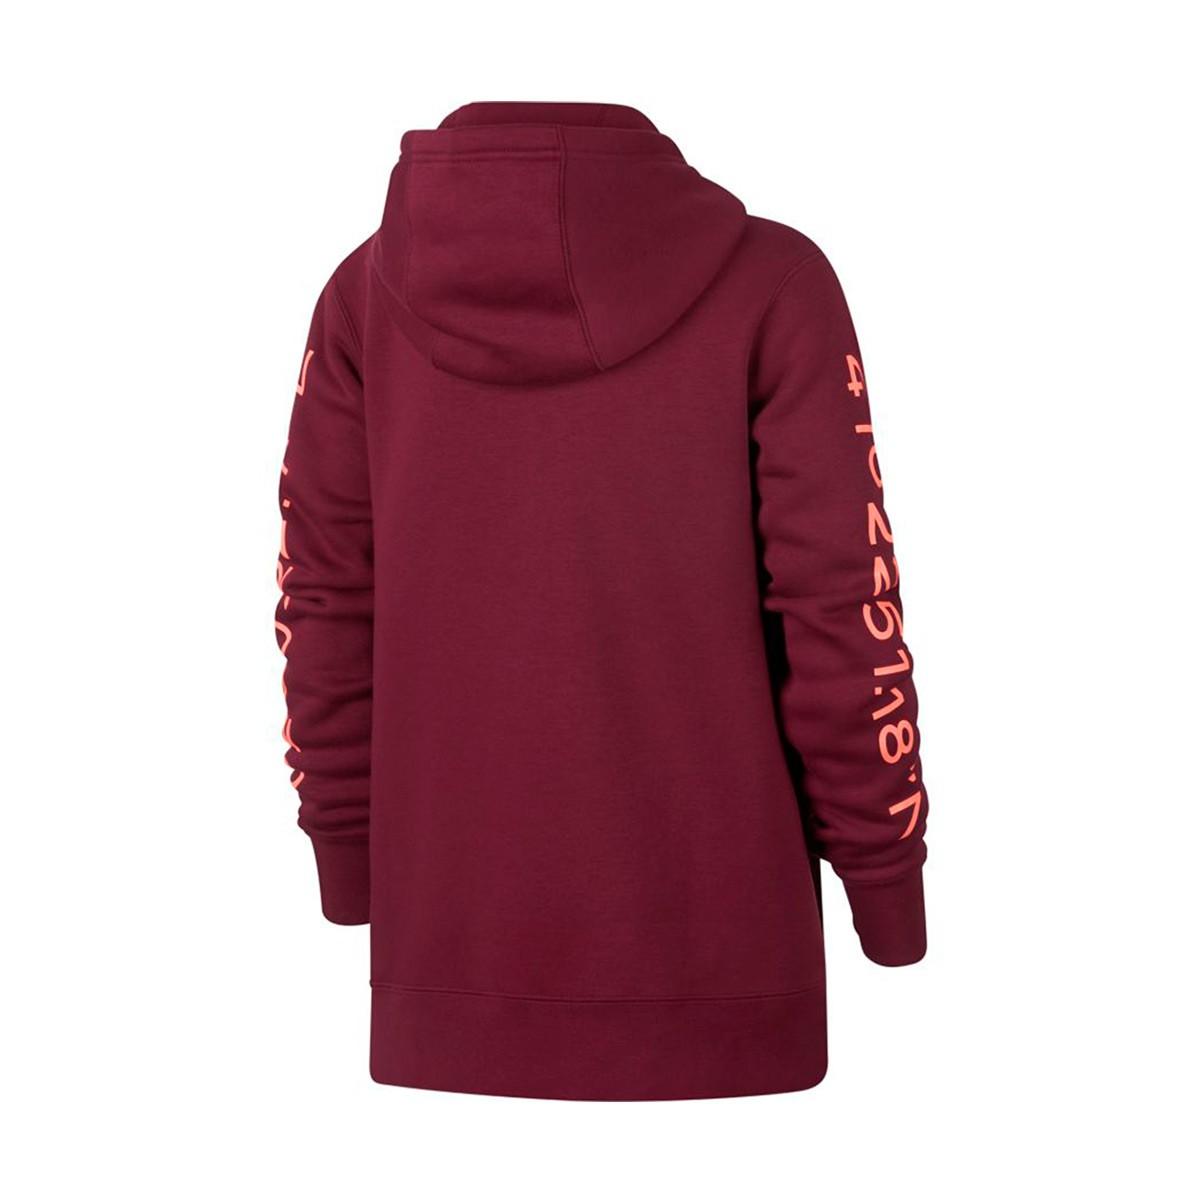 387040c317a Sweatshirt Nike Kids FC Barcelona 2018-2019 Deep maroon-Light atomic ...